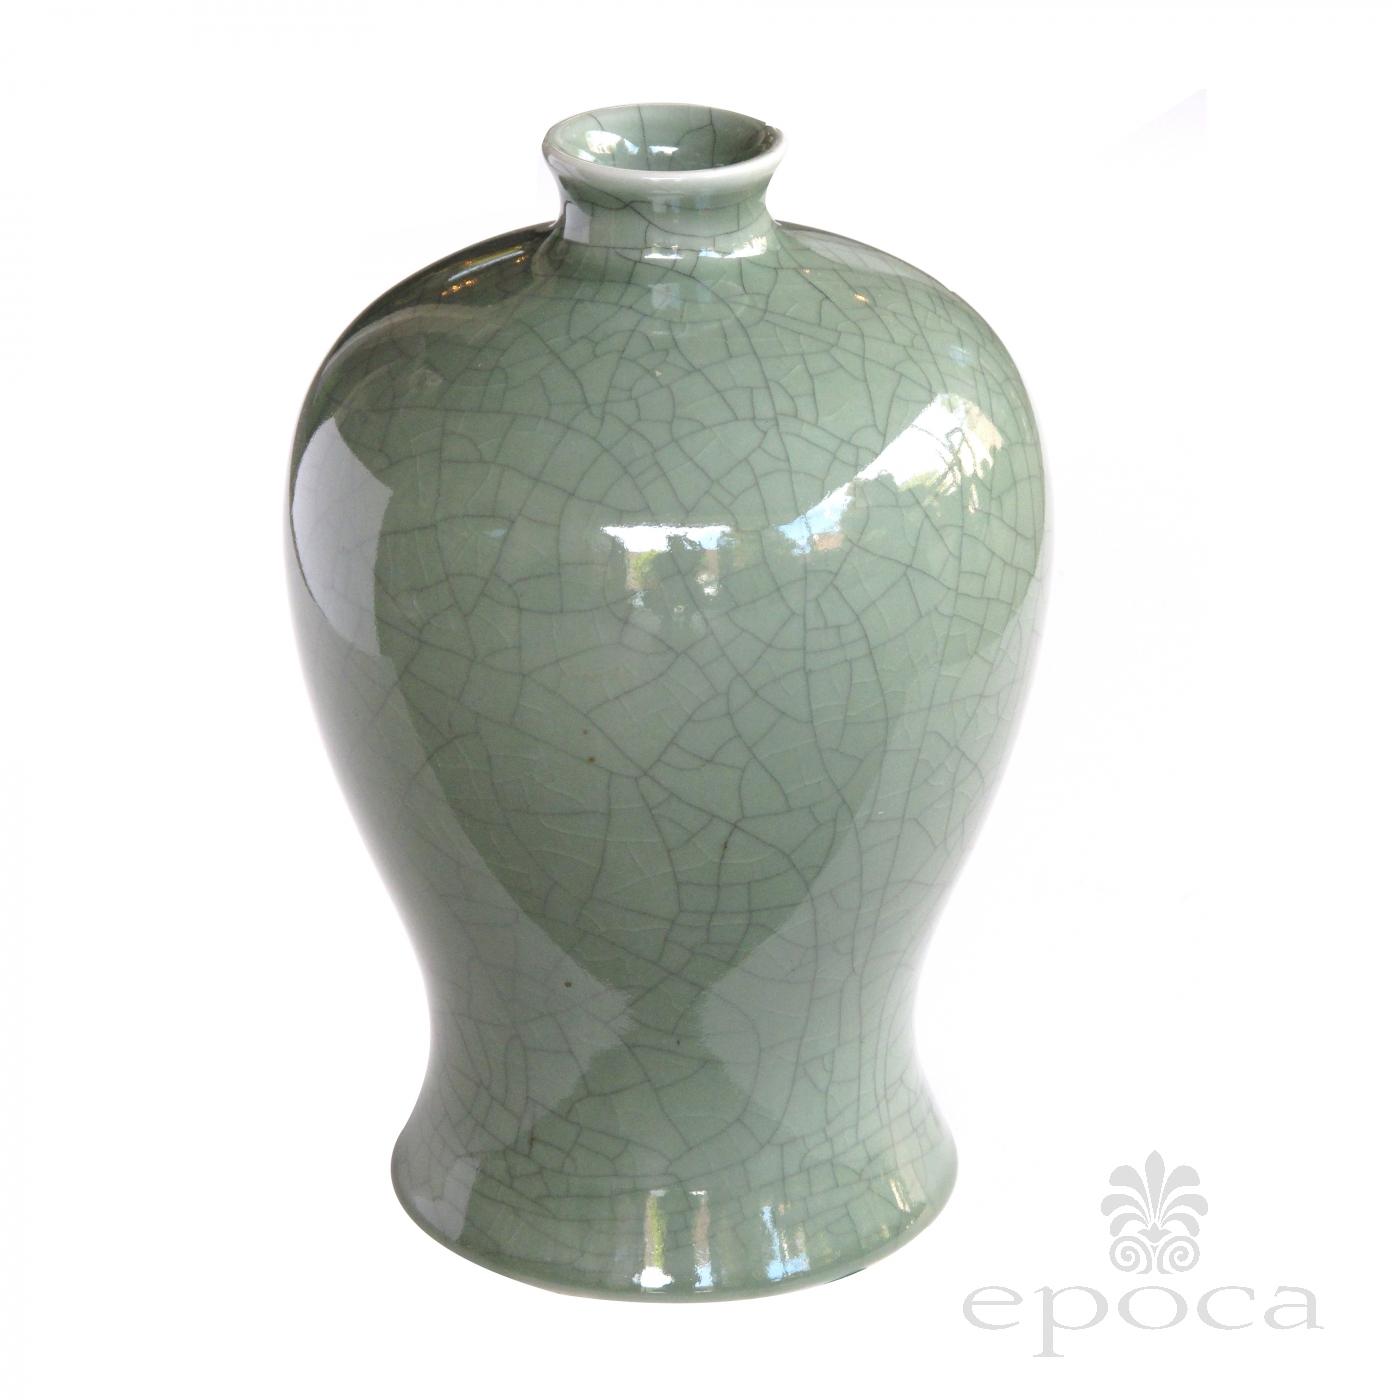 An Elegantly Shaped Chinese Celadon Crackle Glazed Mei